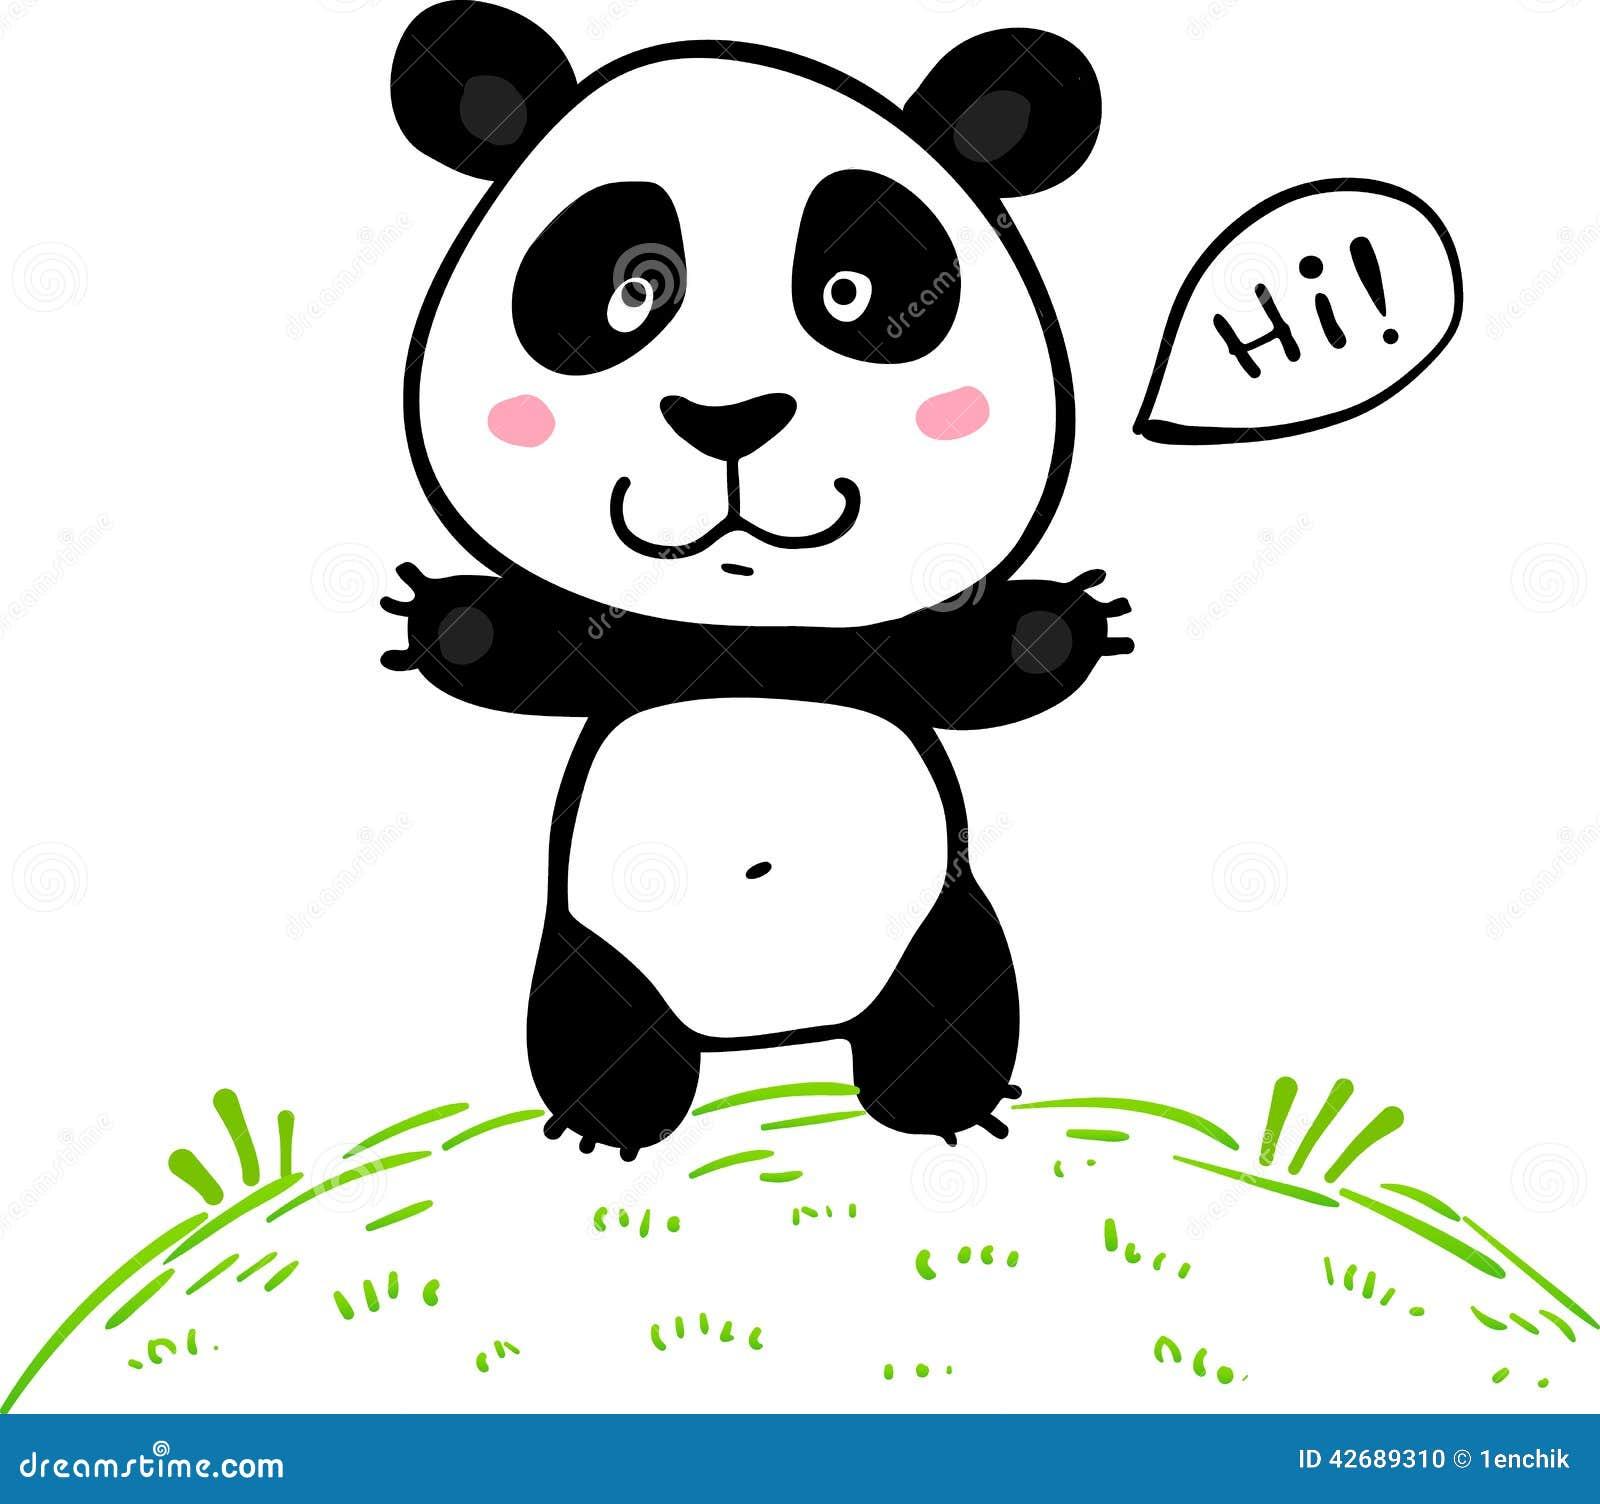 Little cute doodle drawing vector panda stock vector for Cute little doodles to draw